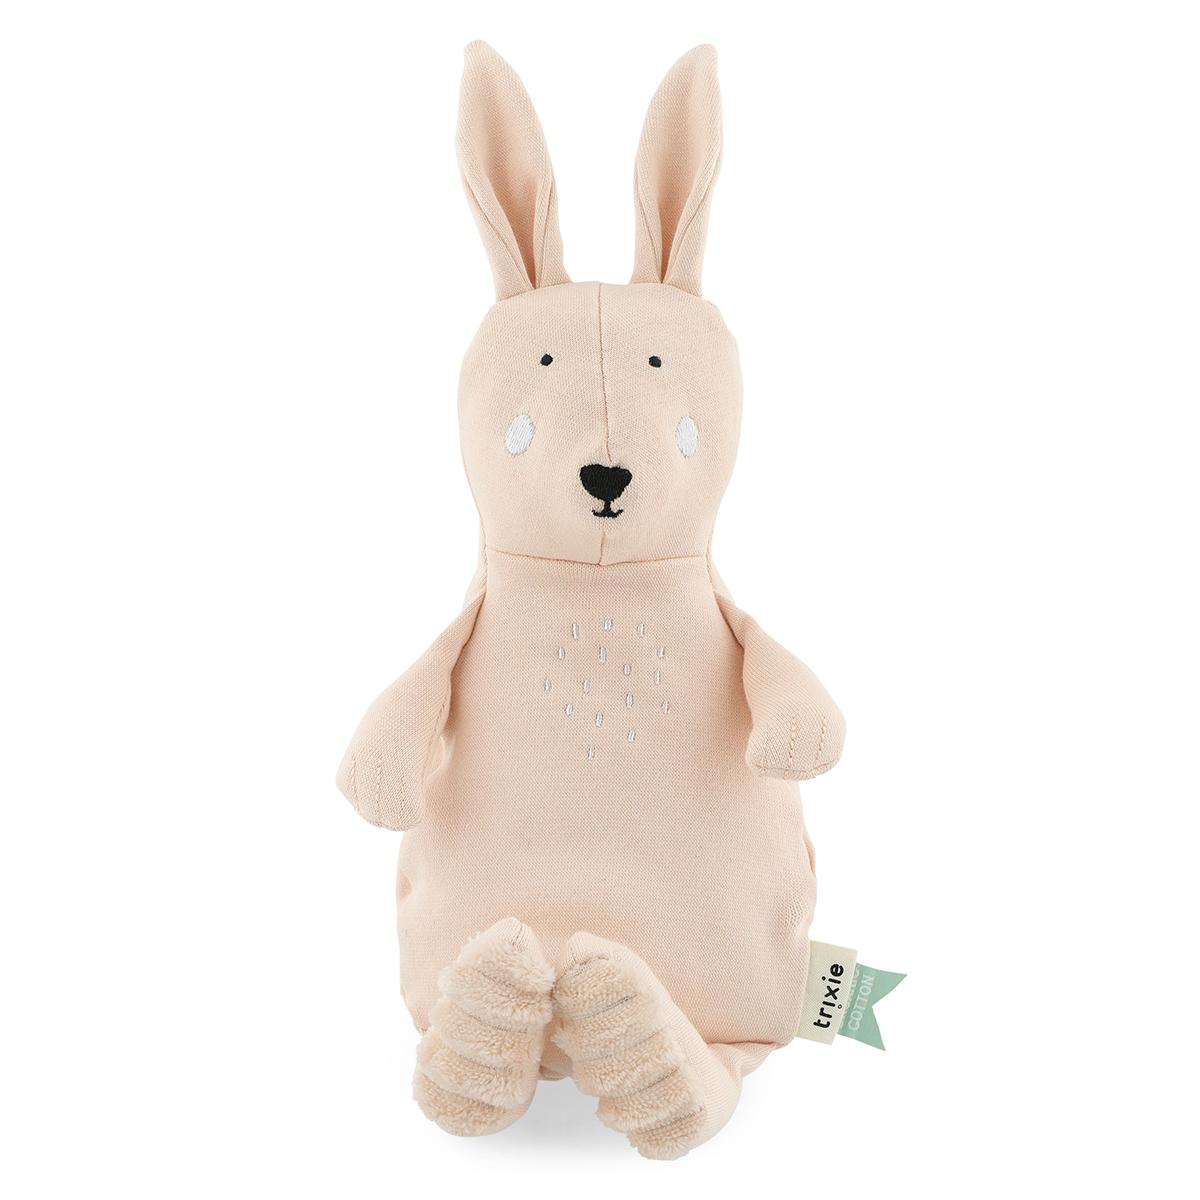 Peluche Petite Peluche Mrs. Rabbit Peluche Lapin 26 cm